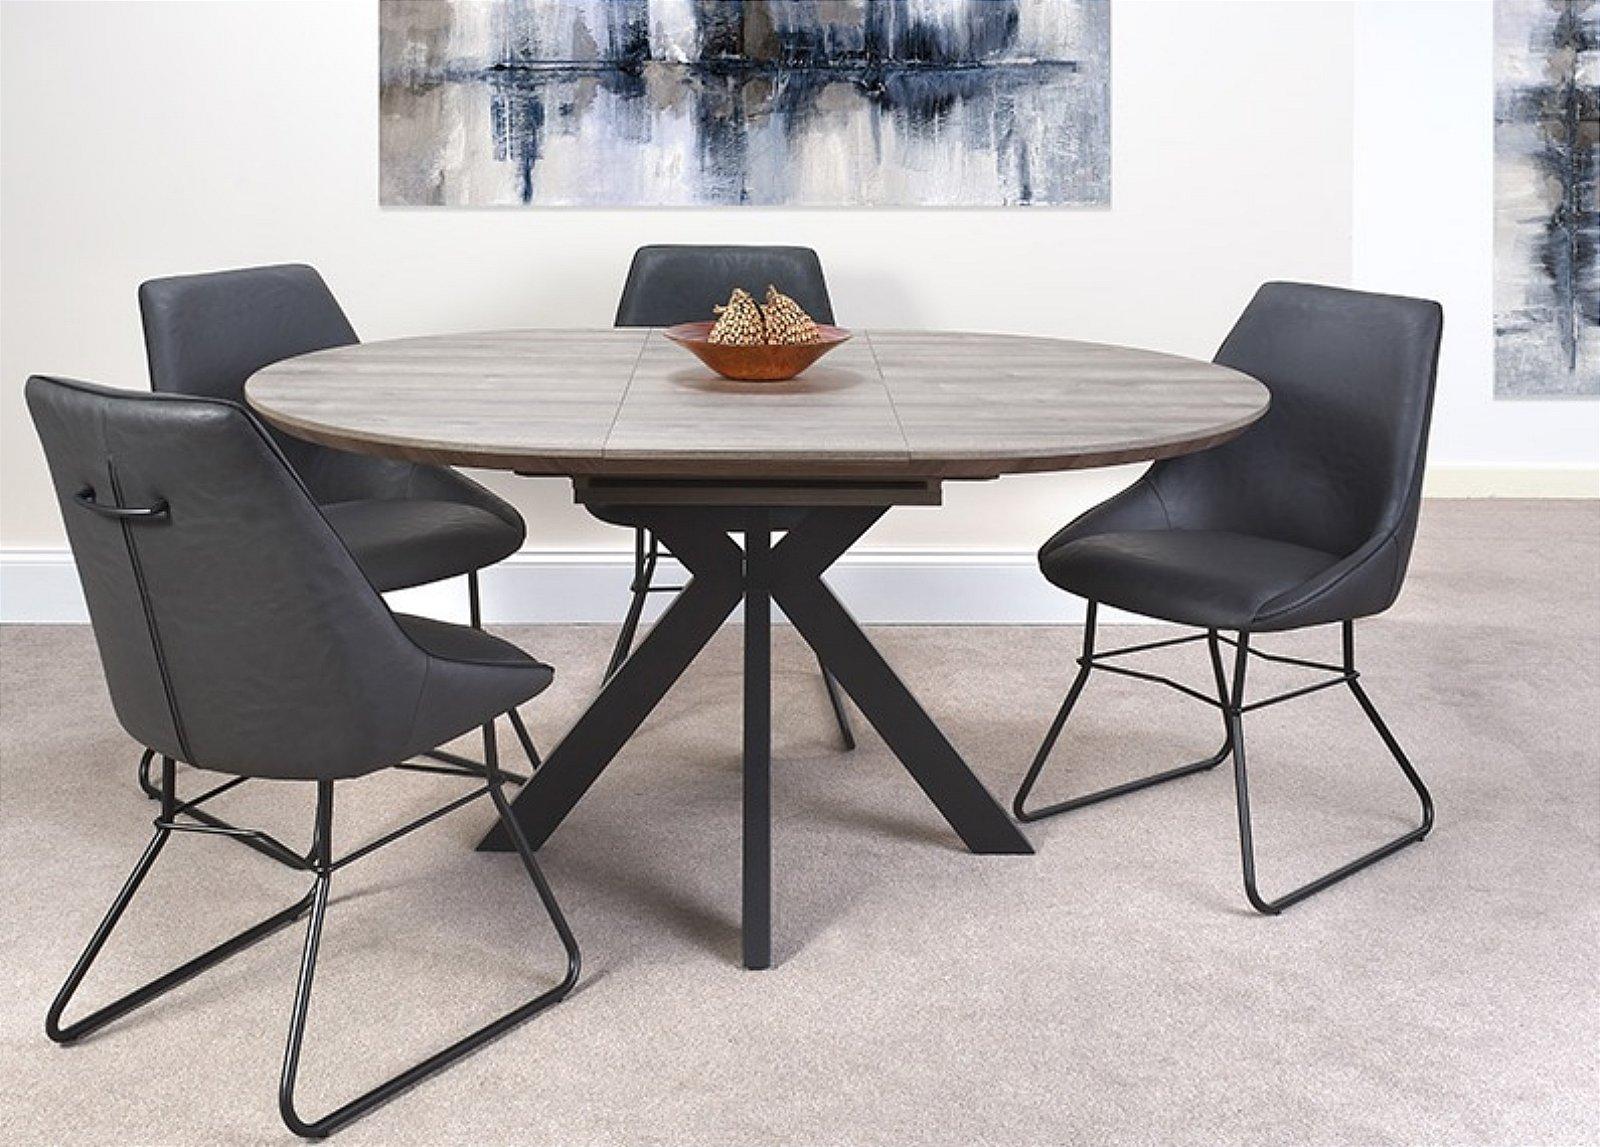 Furniture Link Manhattan Extending Round Dining Table 120 160 Cm